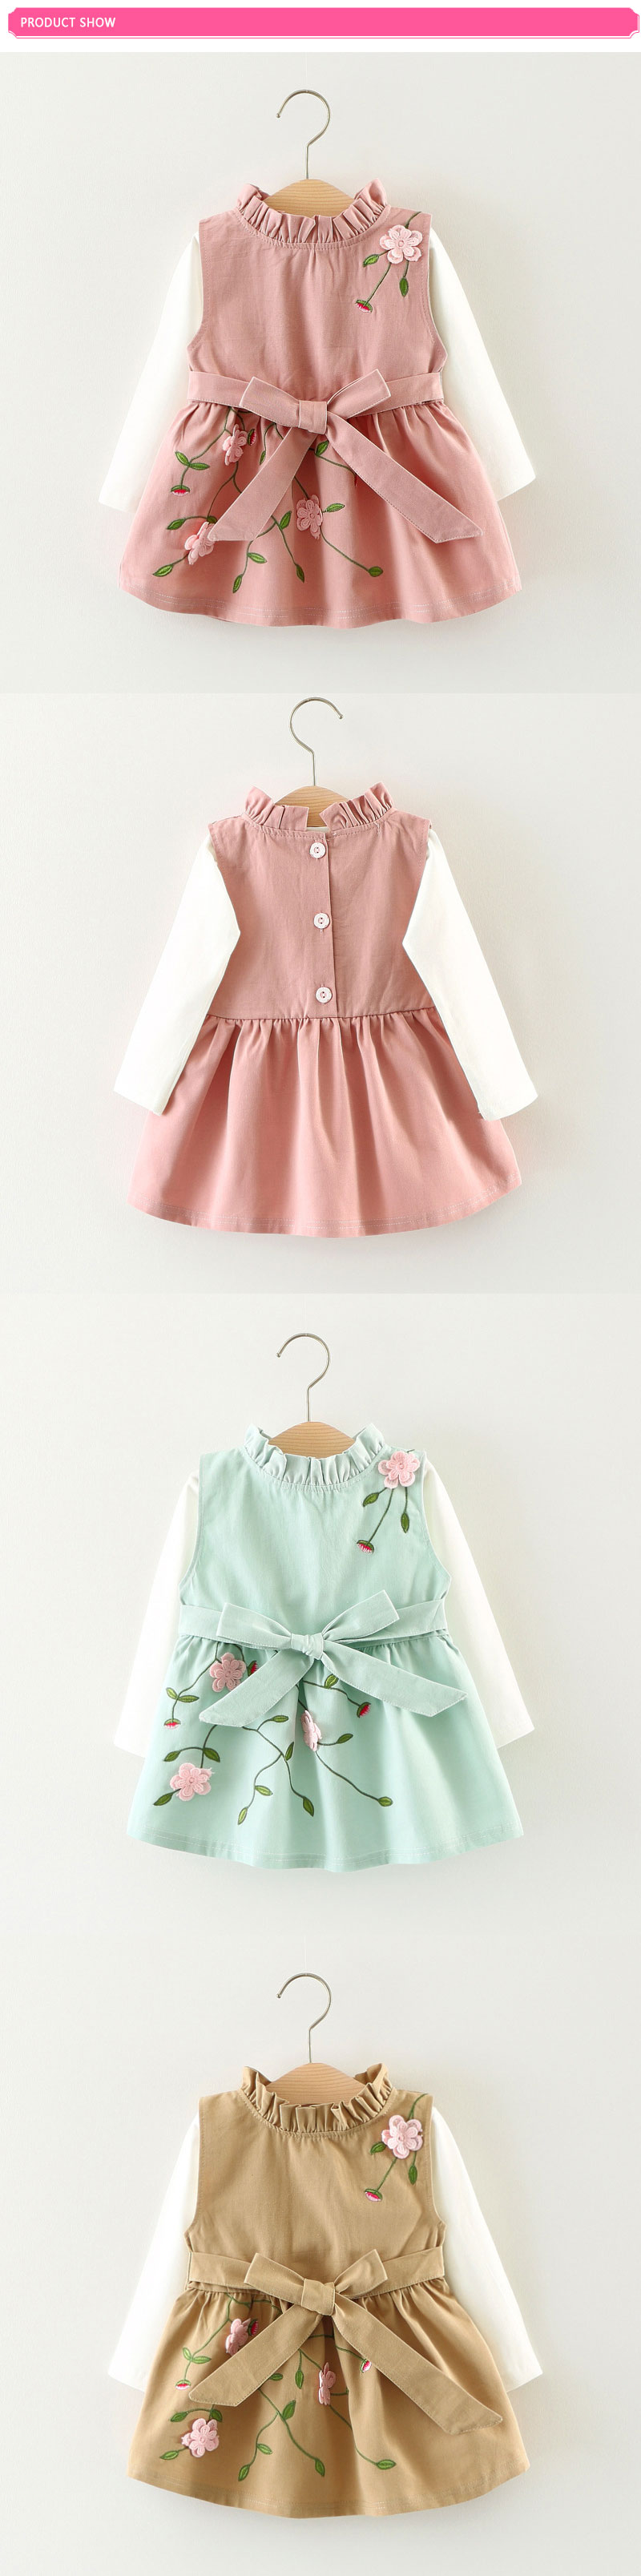 52d7b3d66ee 2017 Baby Girls Dress Autumn 0 3 Year Embroidery 3D Flowers Princess ...